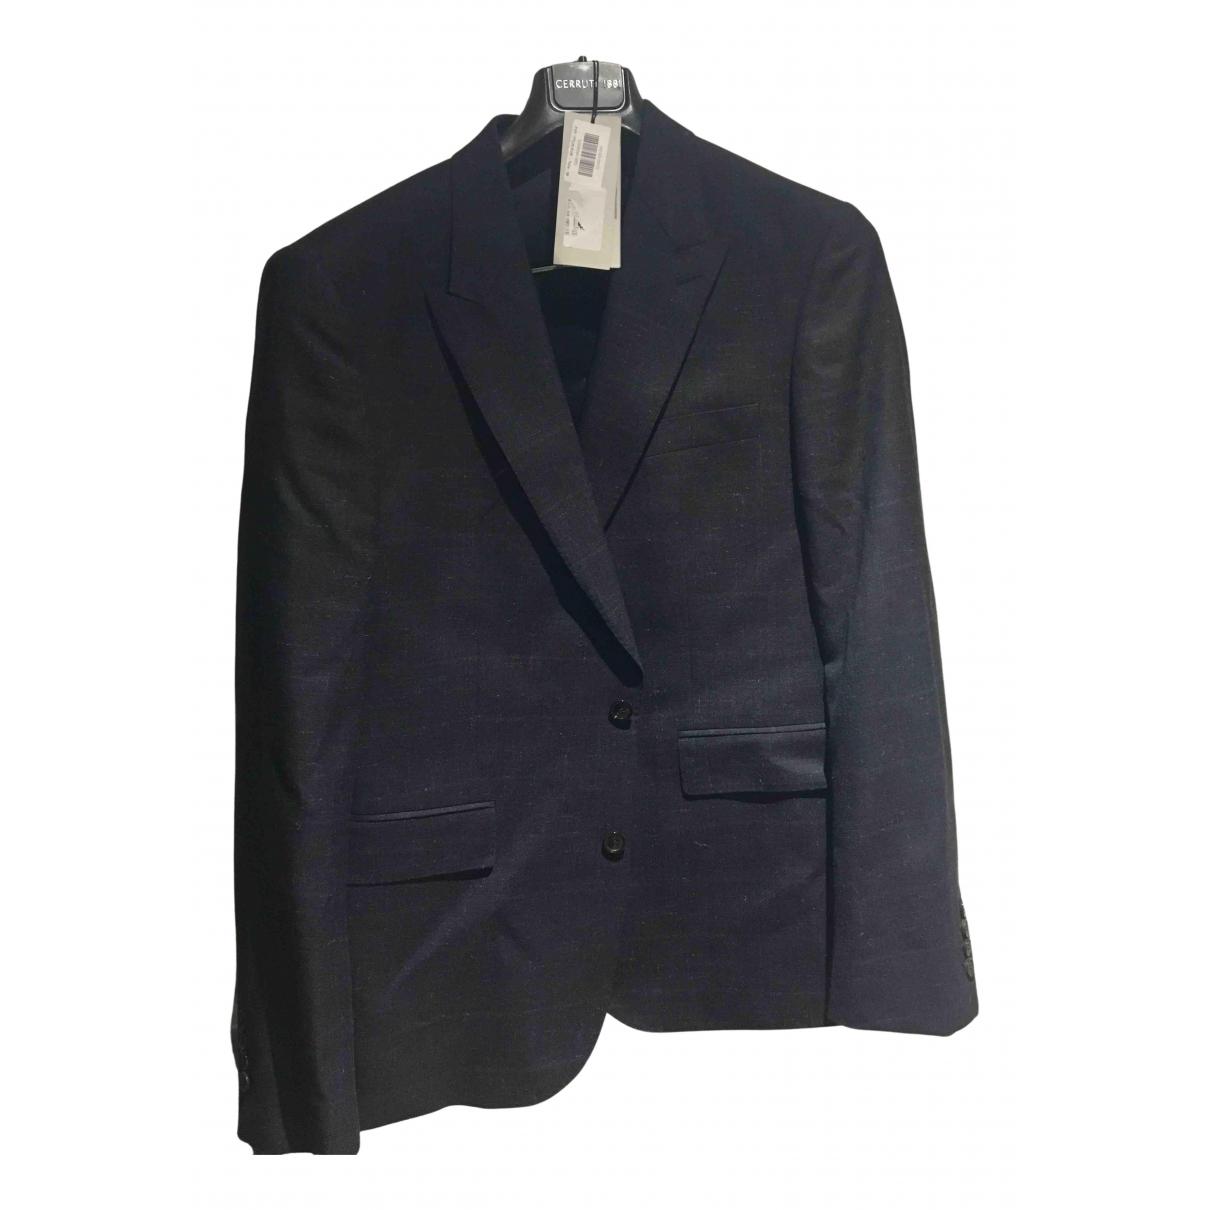 Cerruti N Wool Suits for Men 52 IT